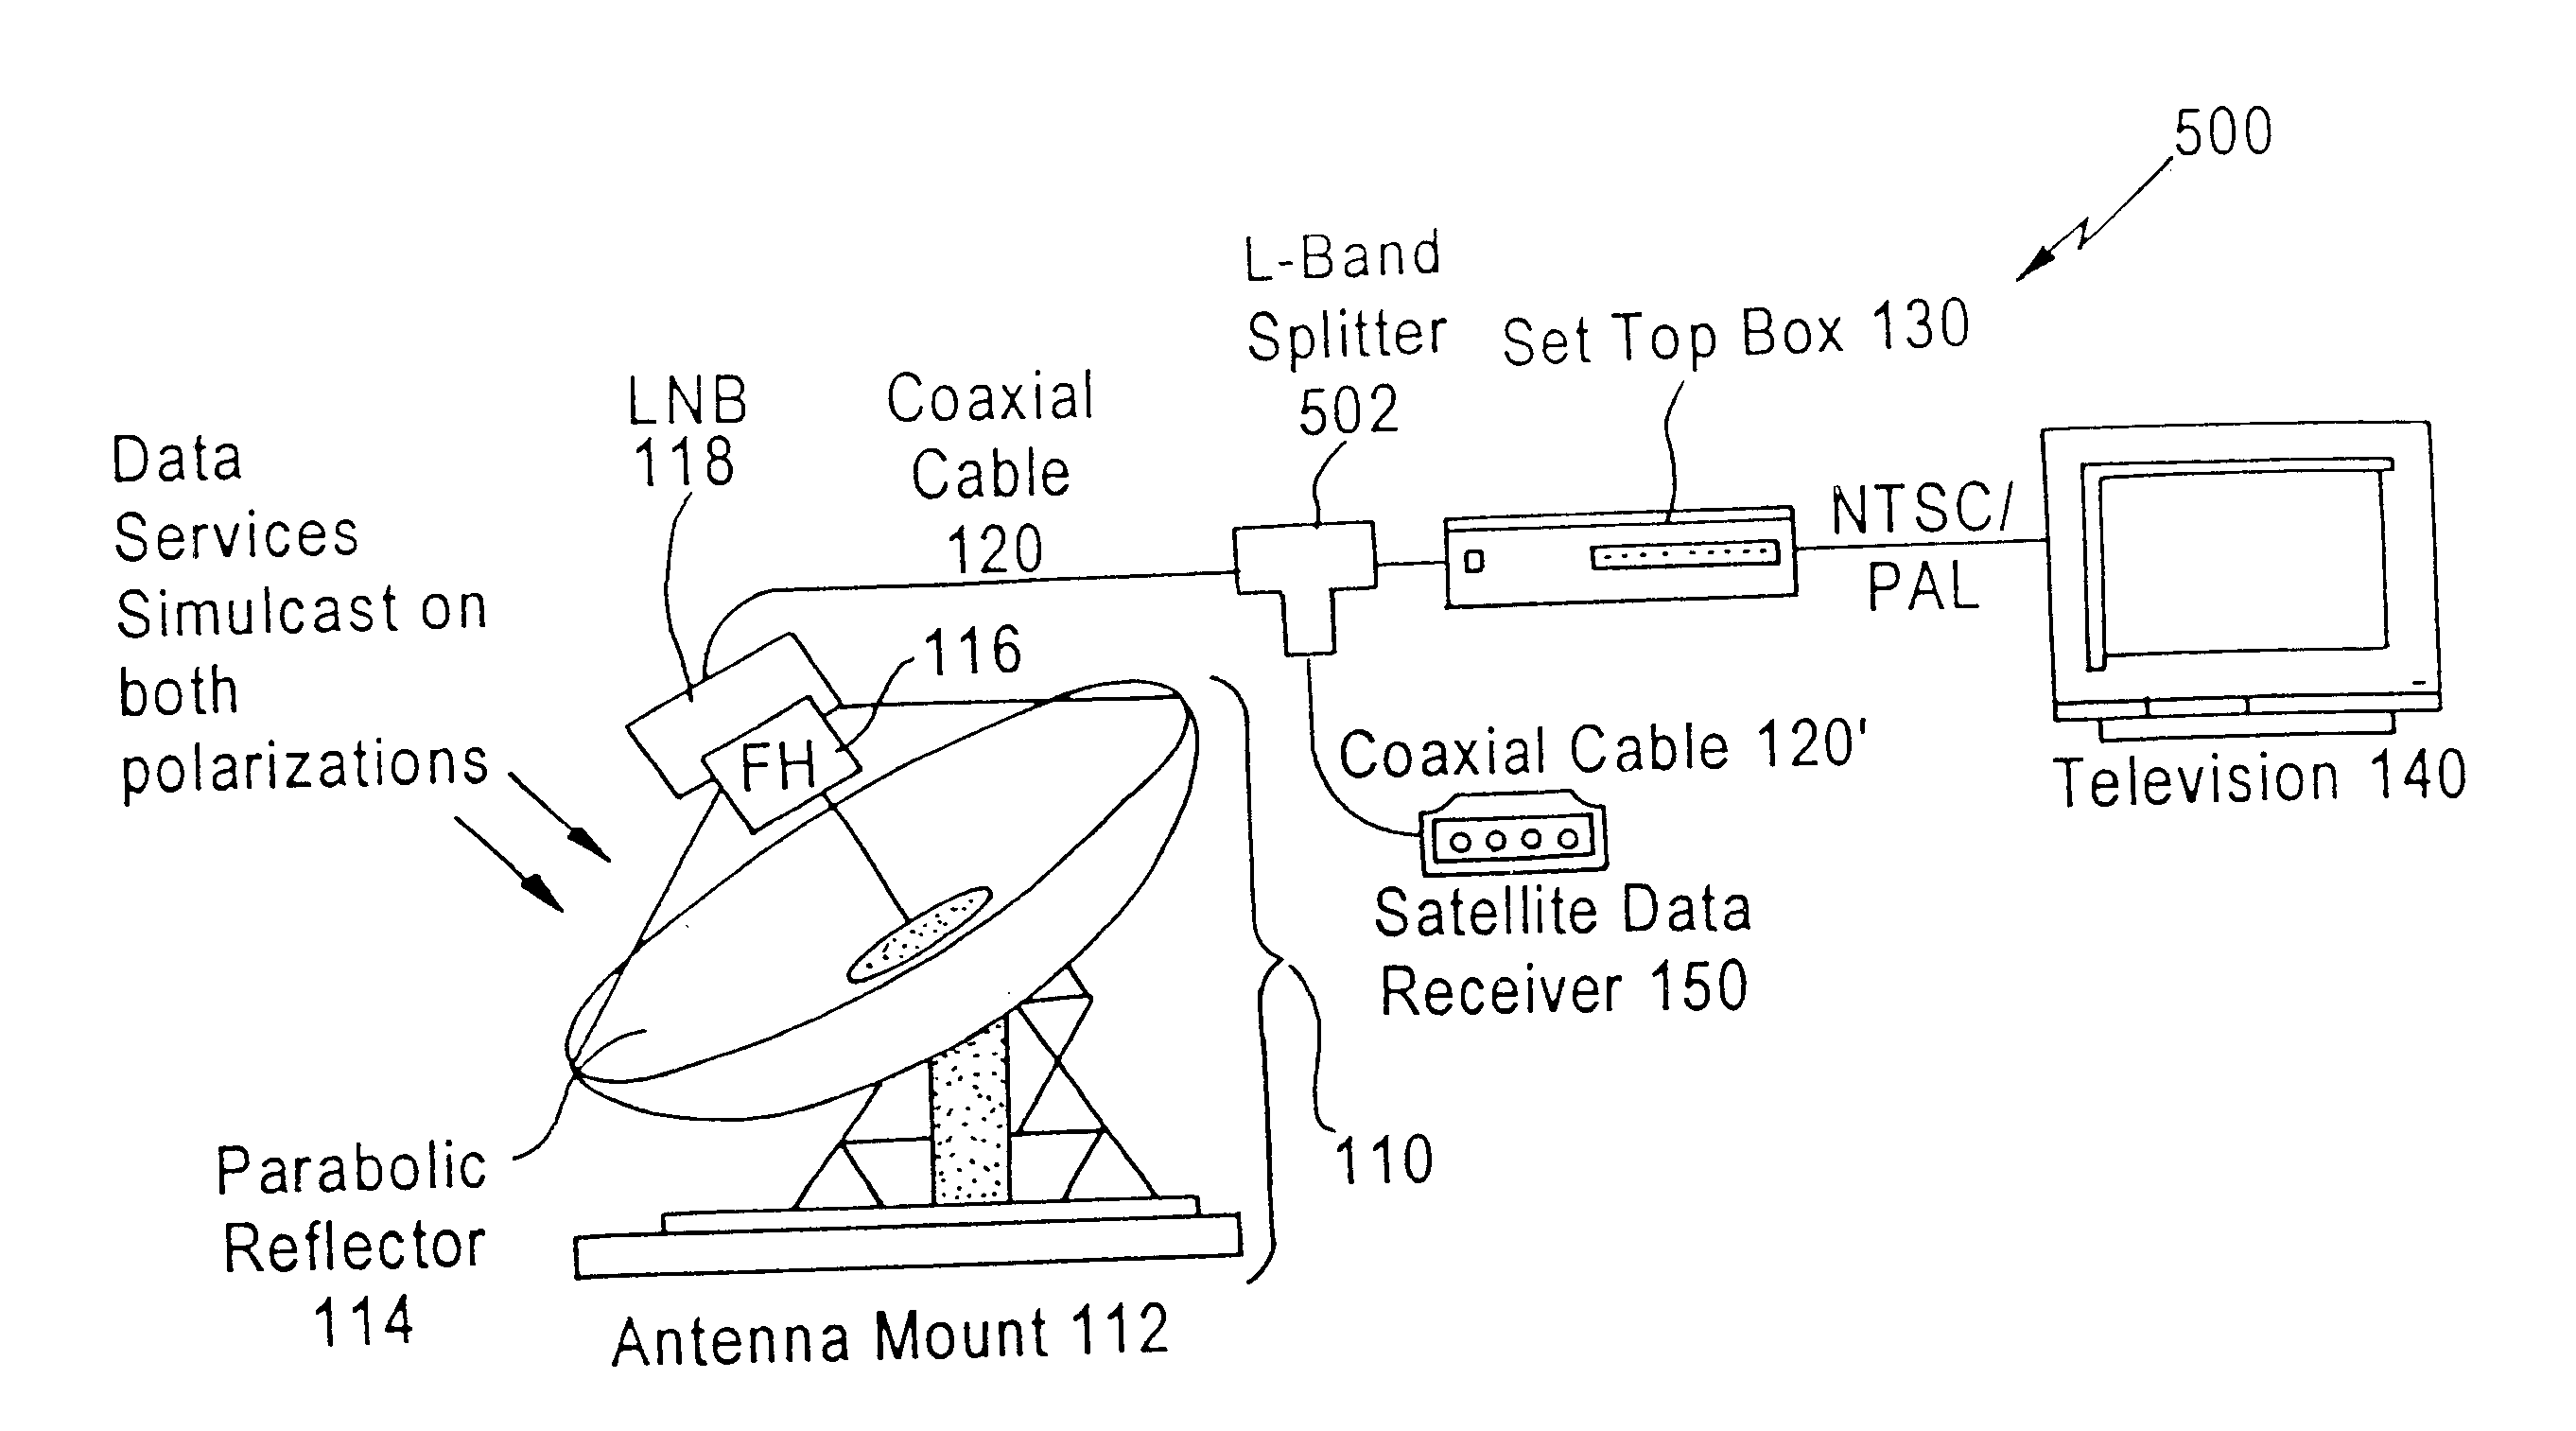 satellite system block diagram the wiring diagram satellite system block diagram vidim wiring diagram block diagram